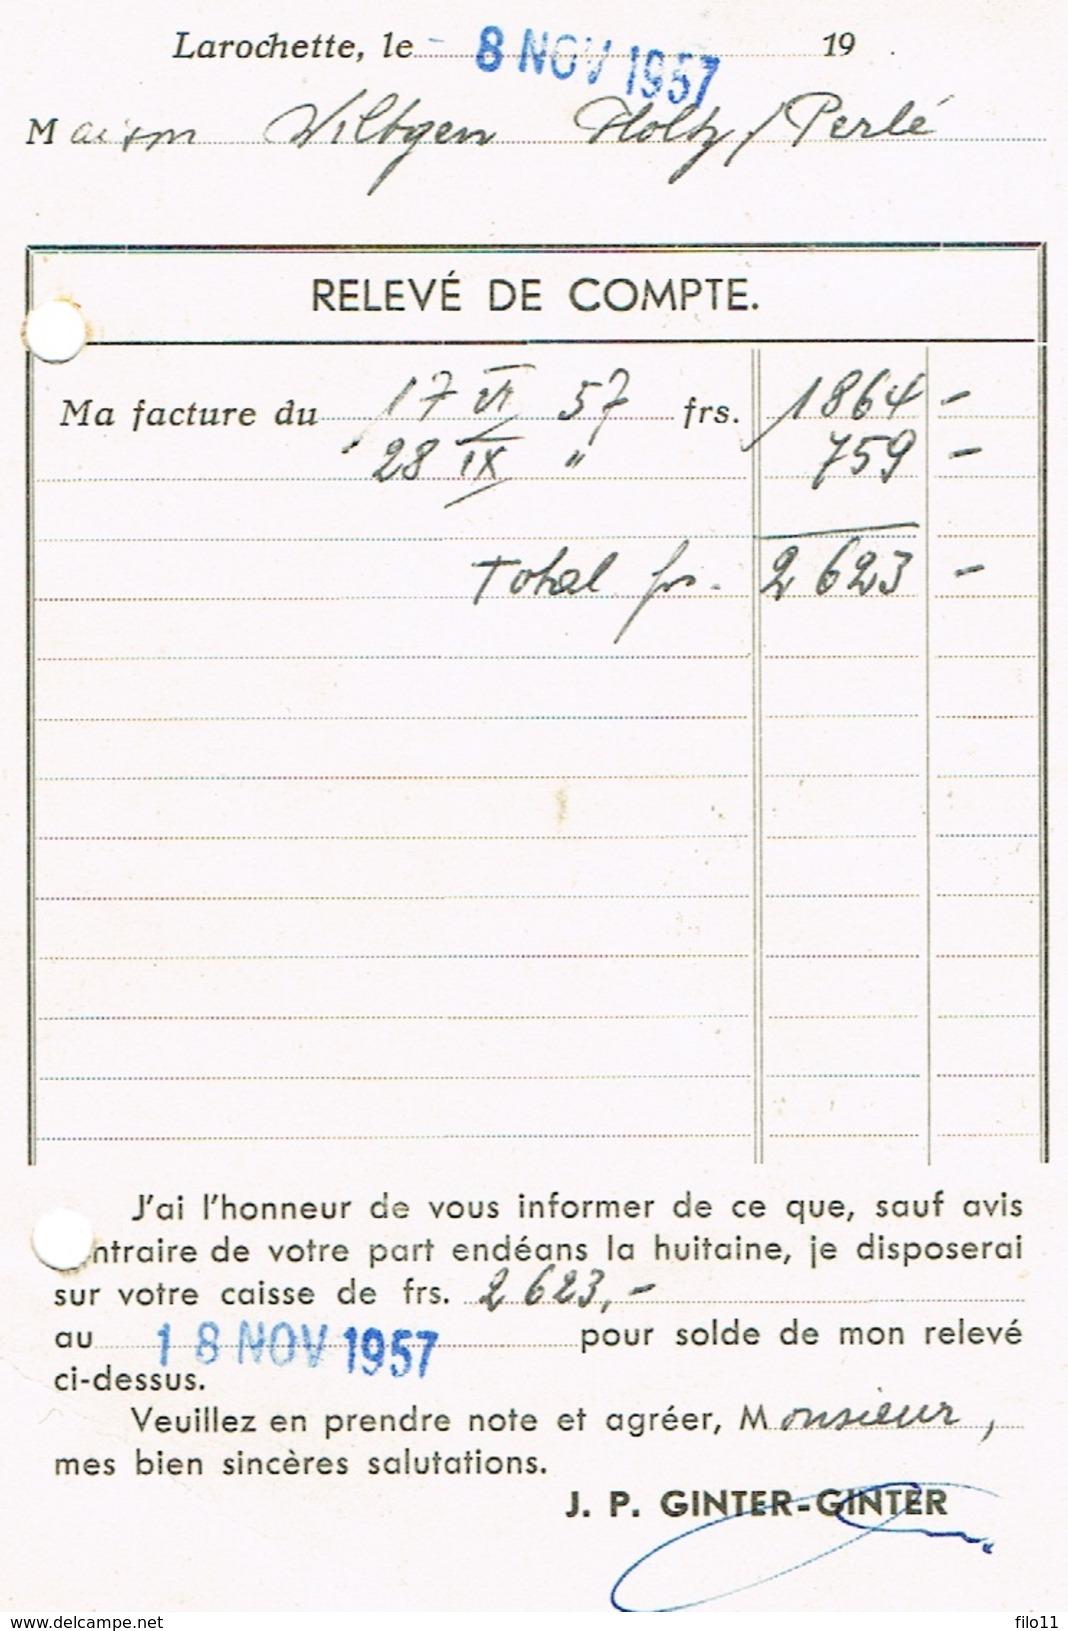 Larochette J.P.Ginter-Ginter (Relevé De Compte) 1957 - Stamped Stationery